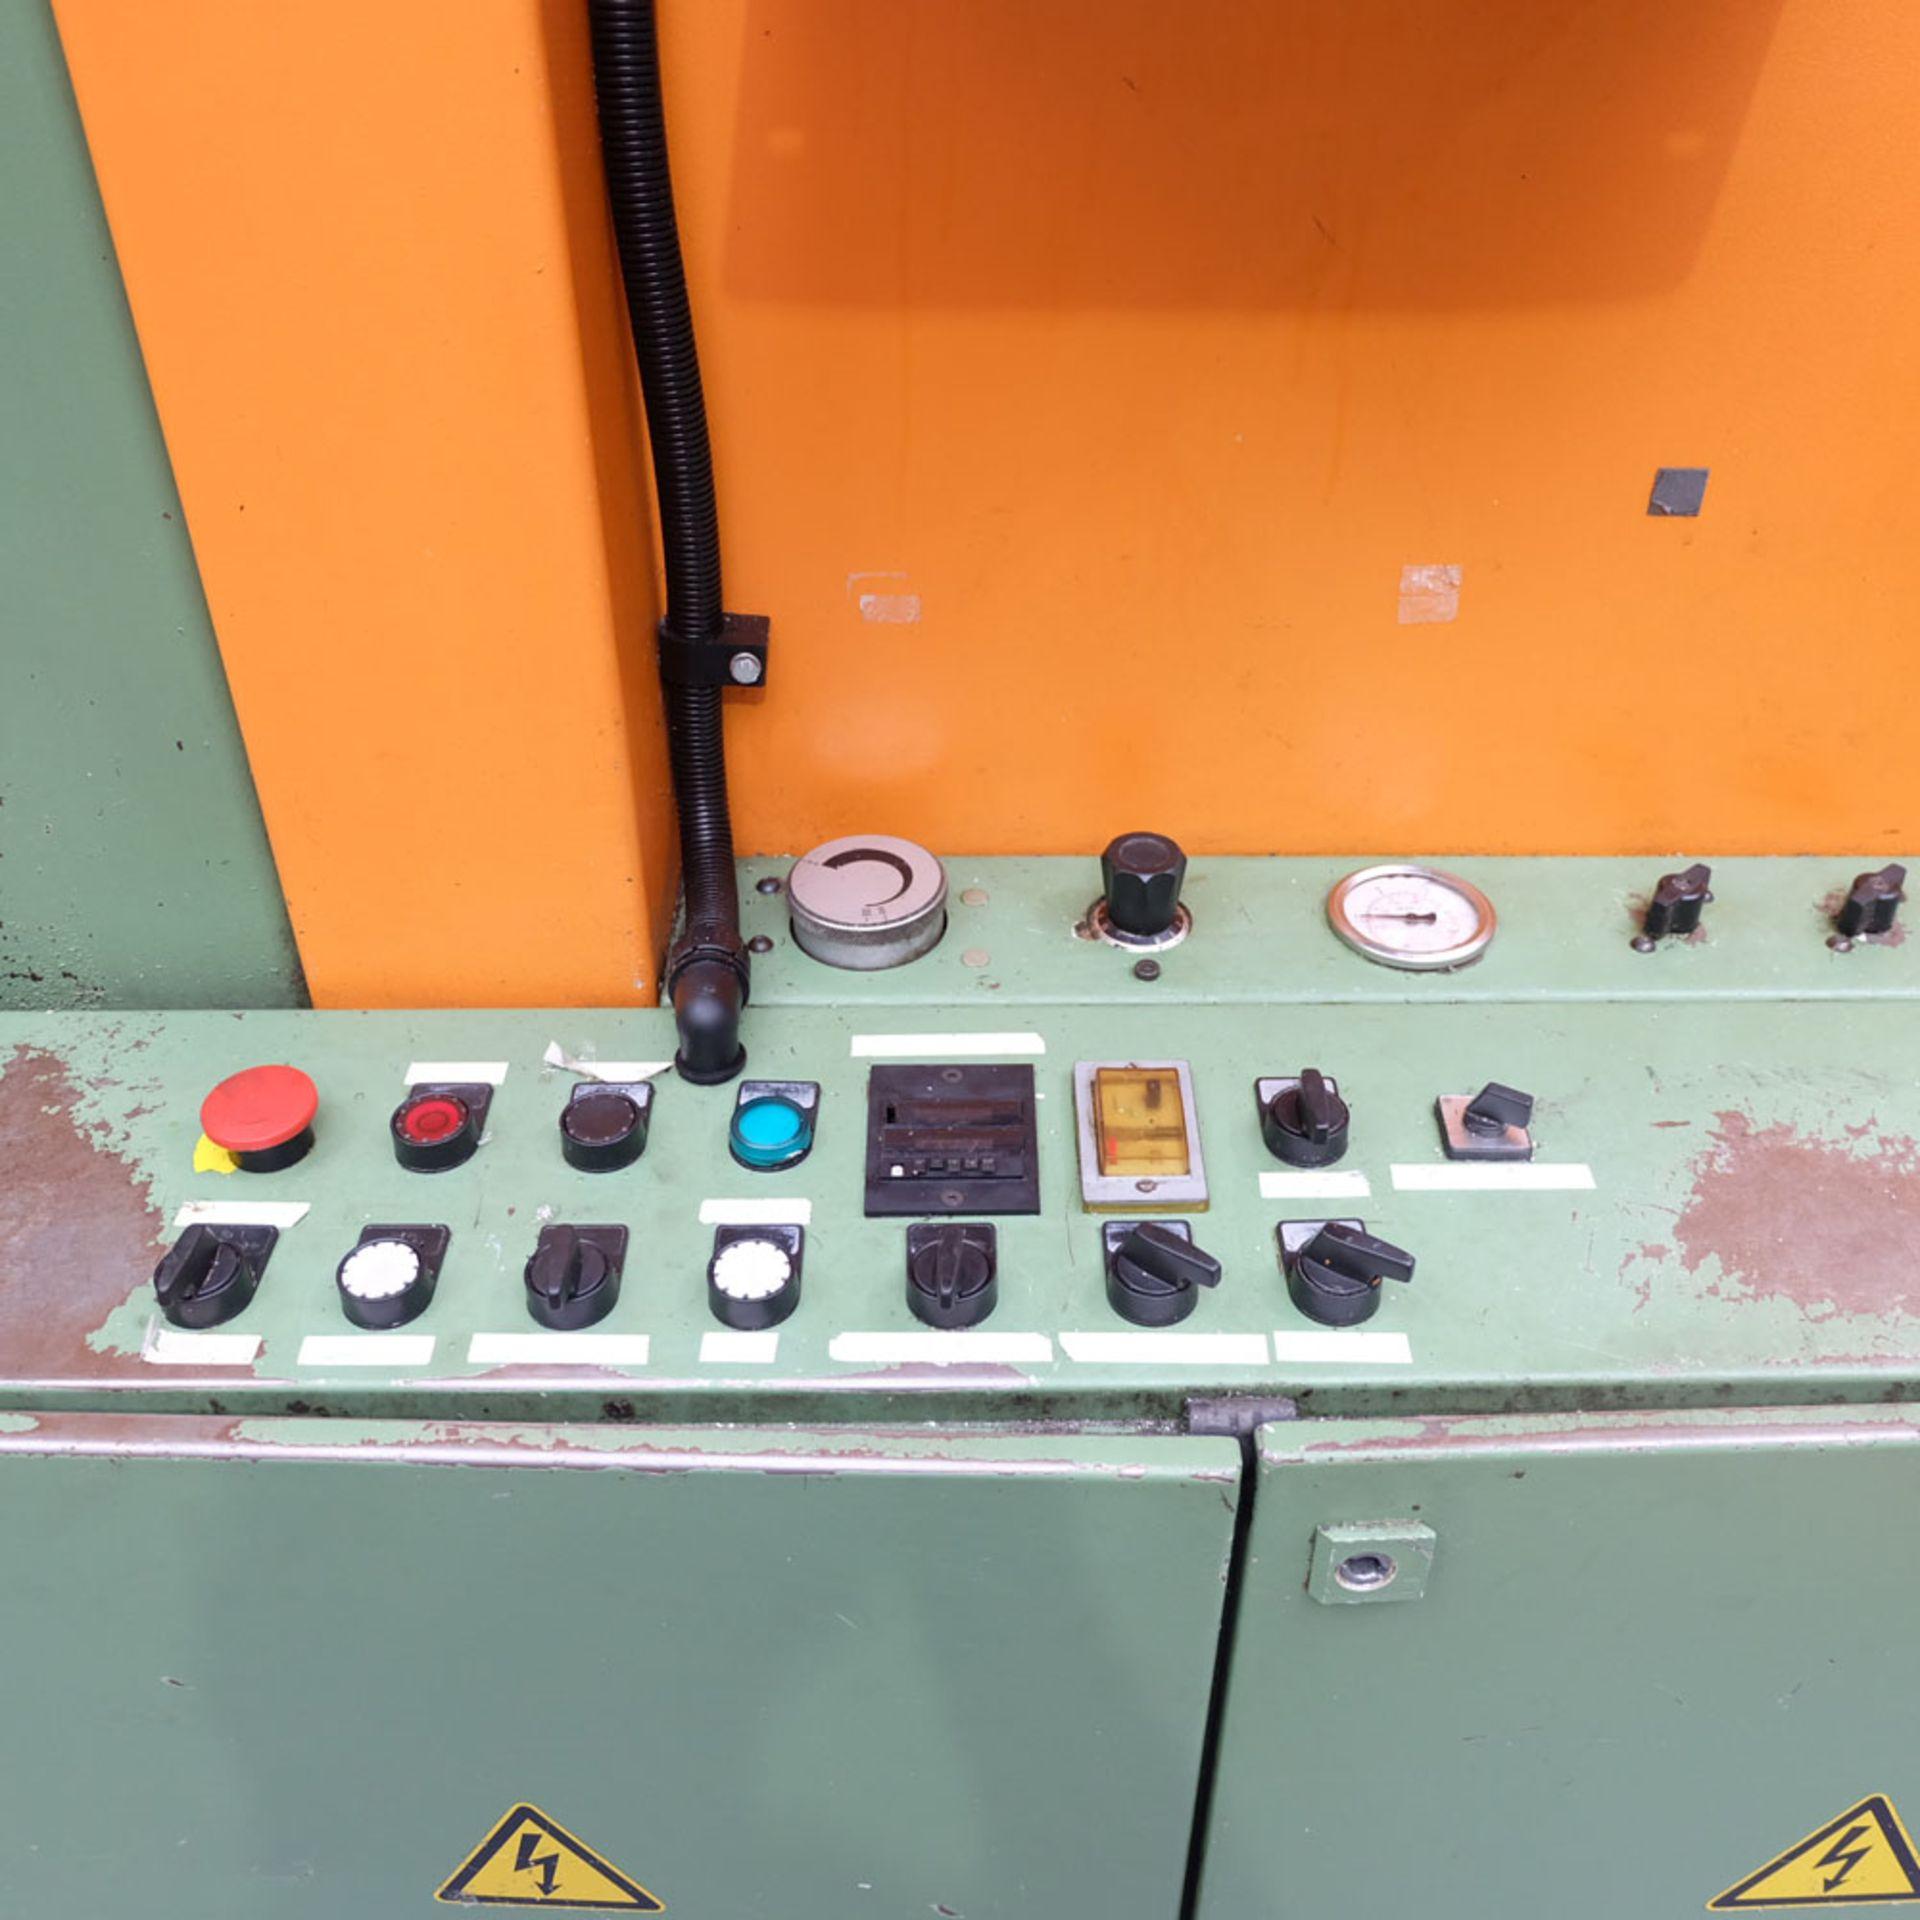 Kasto HBA 420 AU Heavy Duty Automatic Horizontal Band Sawing Machine. - Image 3 of 7